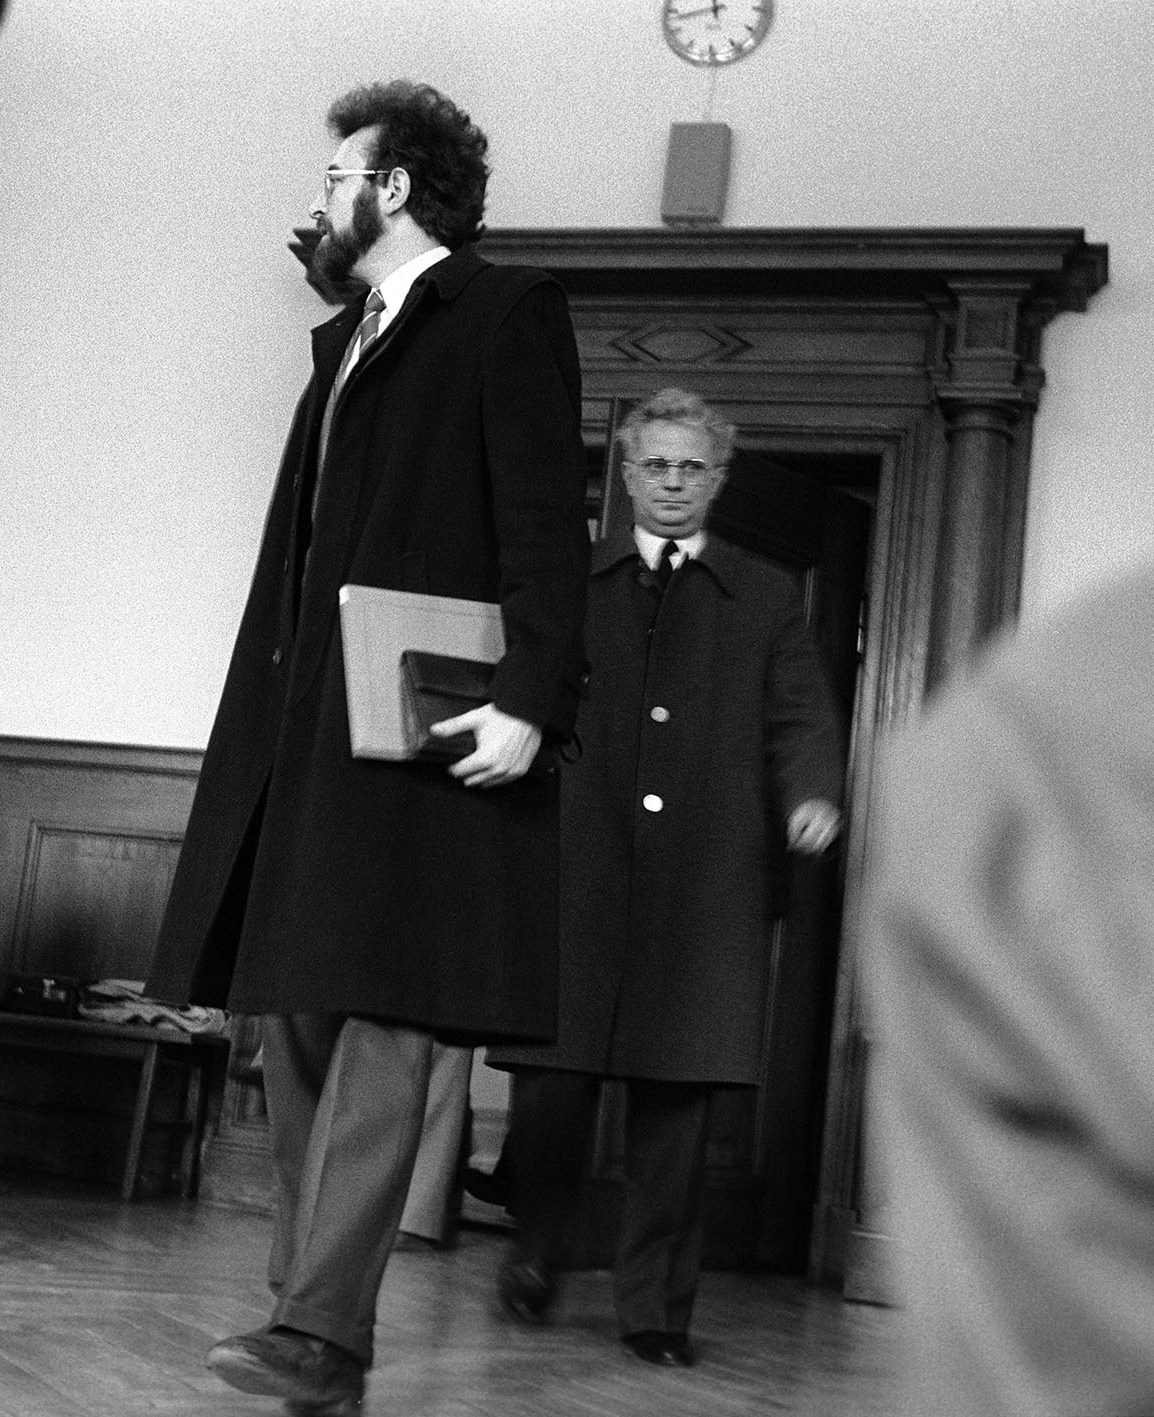 Paul Mai 1985 als Zeuge vor Gericht. Foto: Horst Hanske/  Bilddokumentation Stadt Regensburg